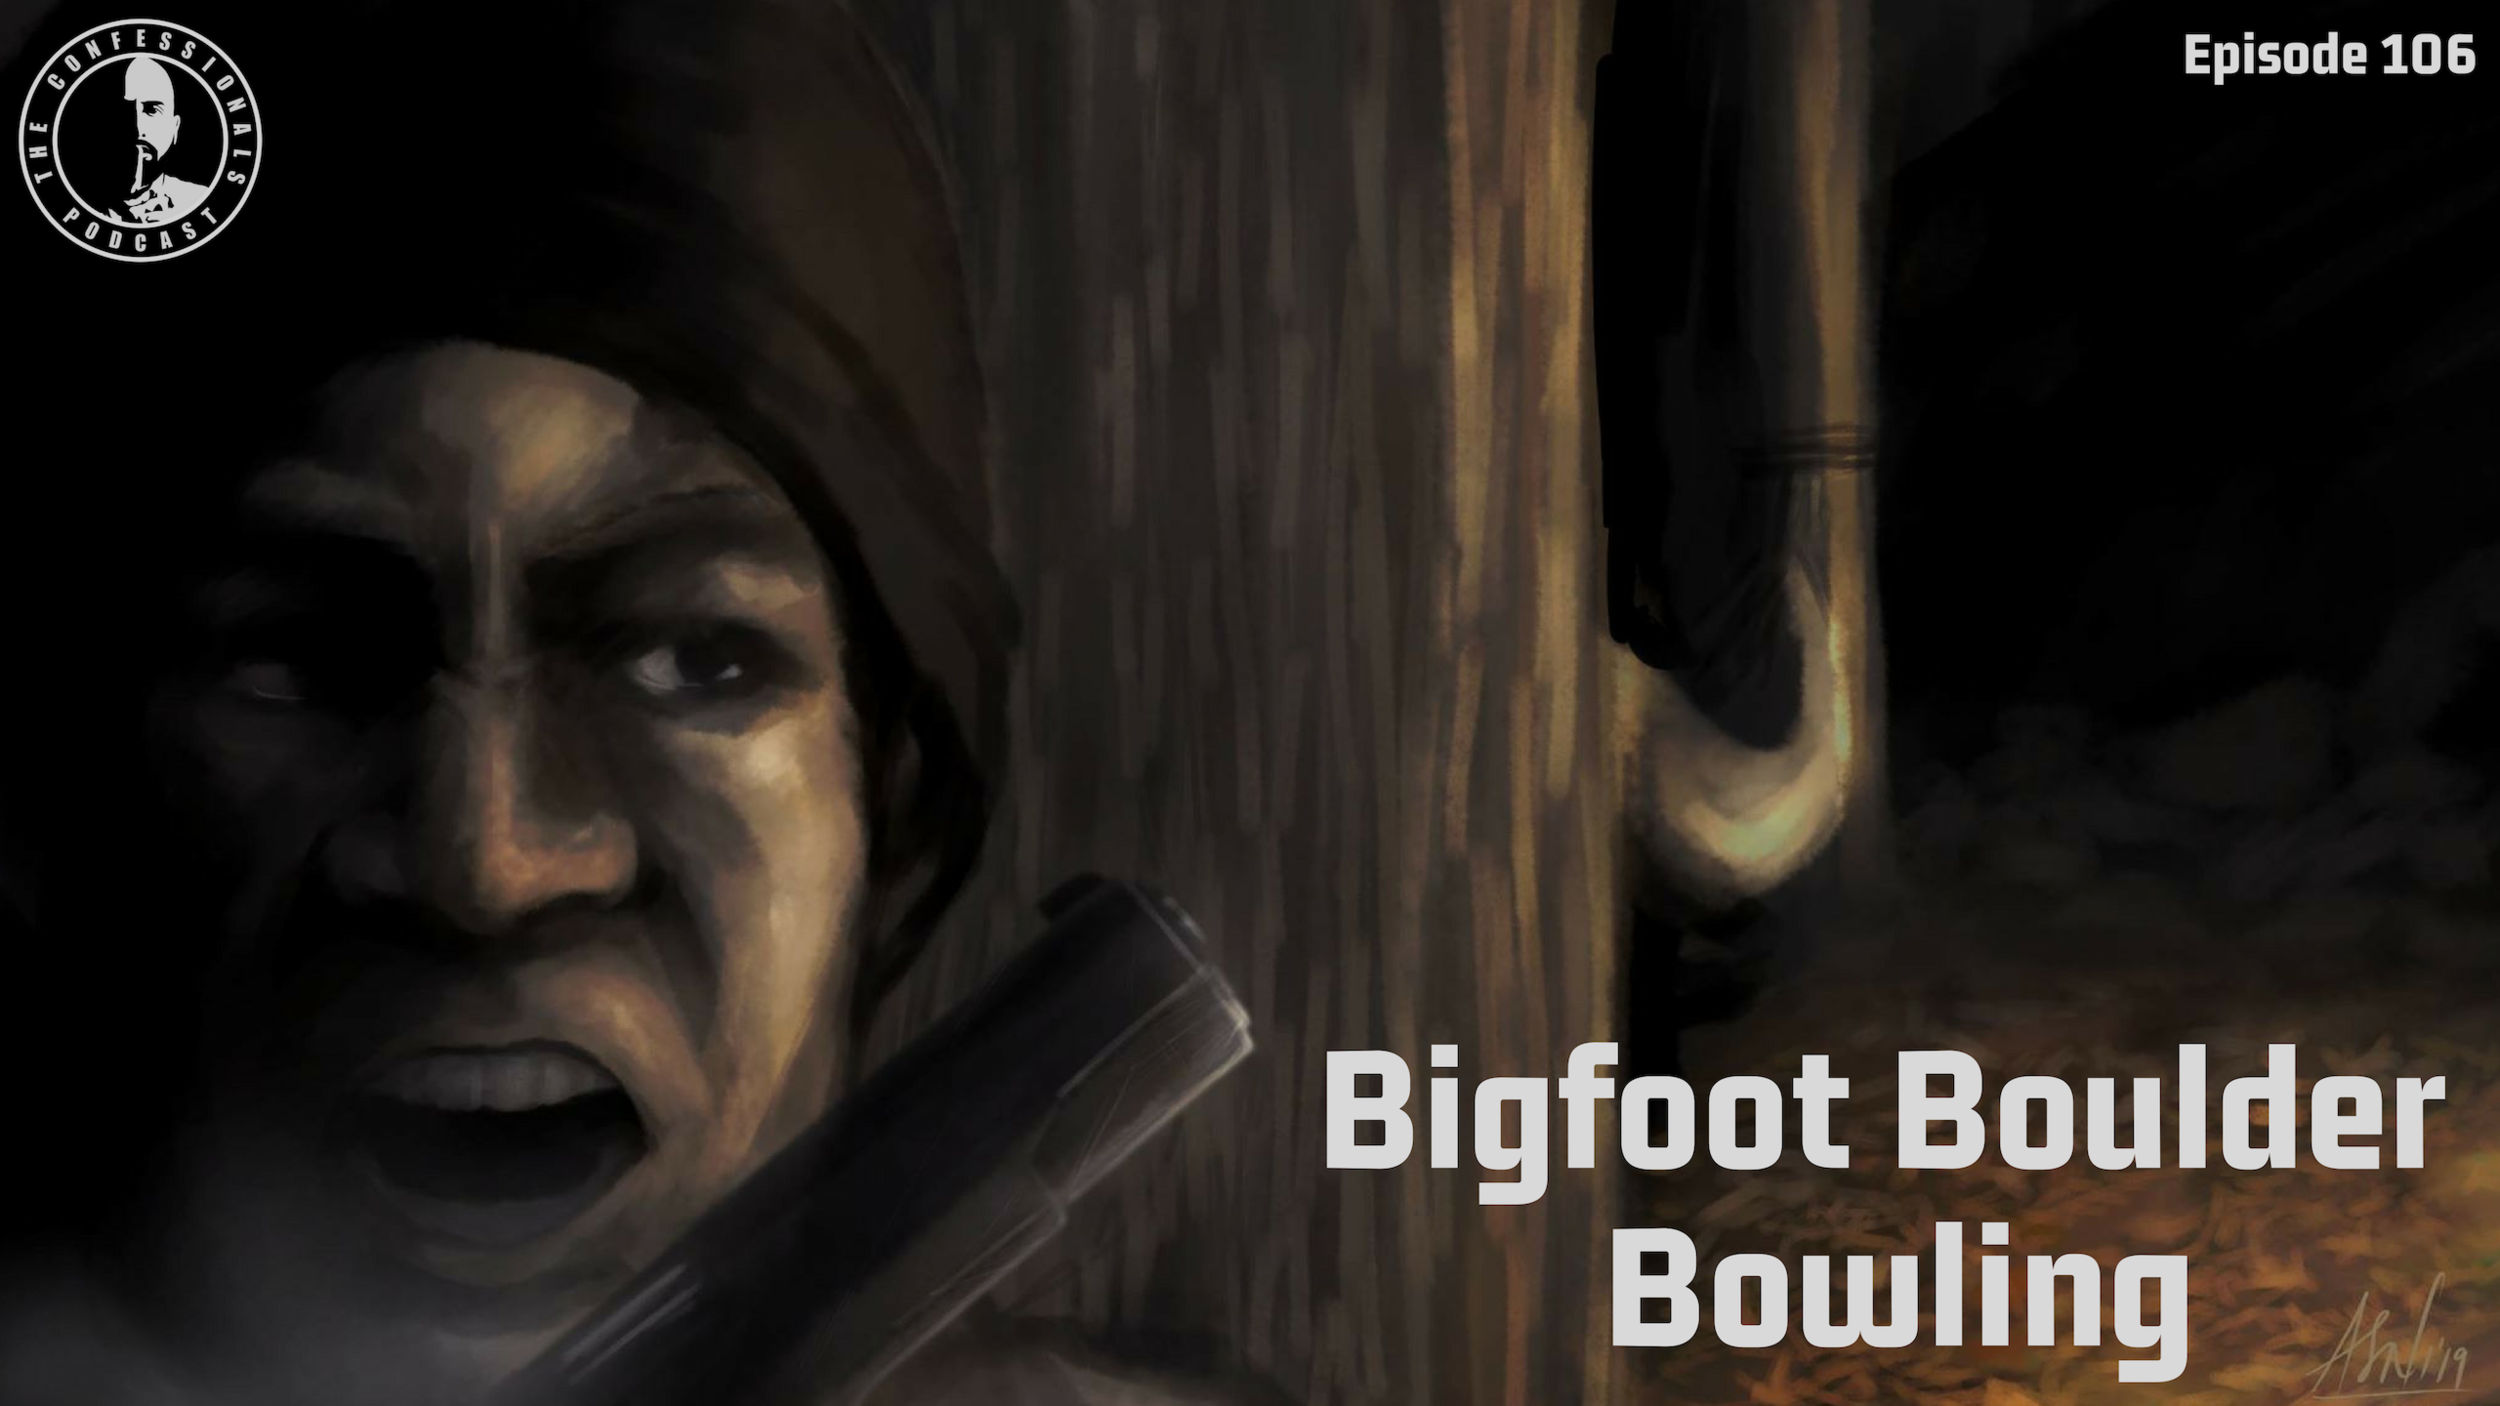 Bigfoot Boulder Bowling.png